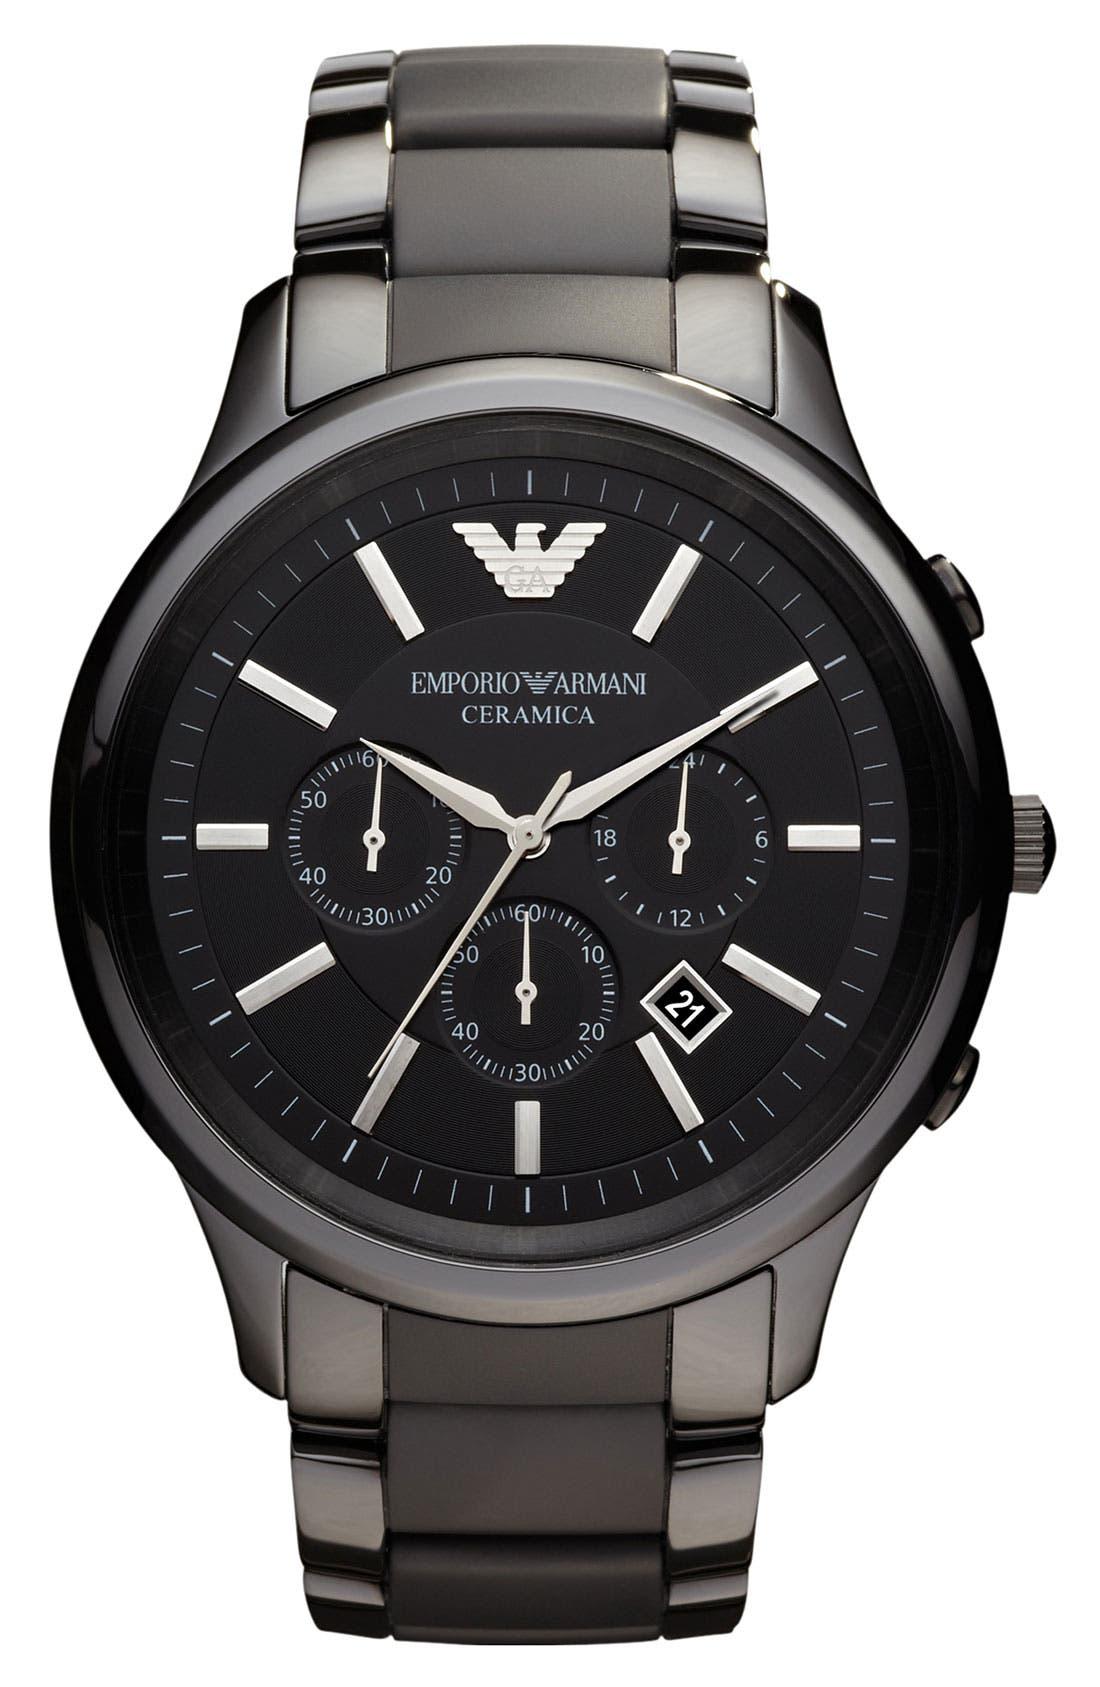 Main Image - Emporio Armani Large Ceramic Chronograph Watch, 47mm